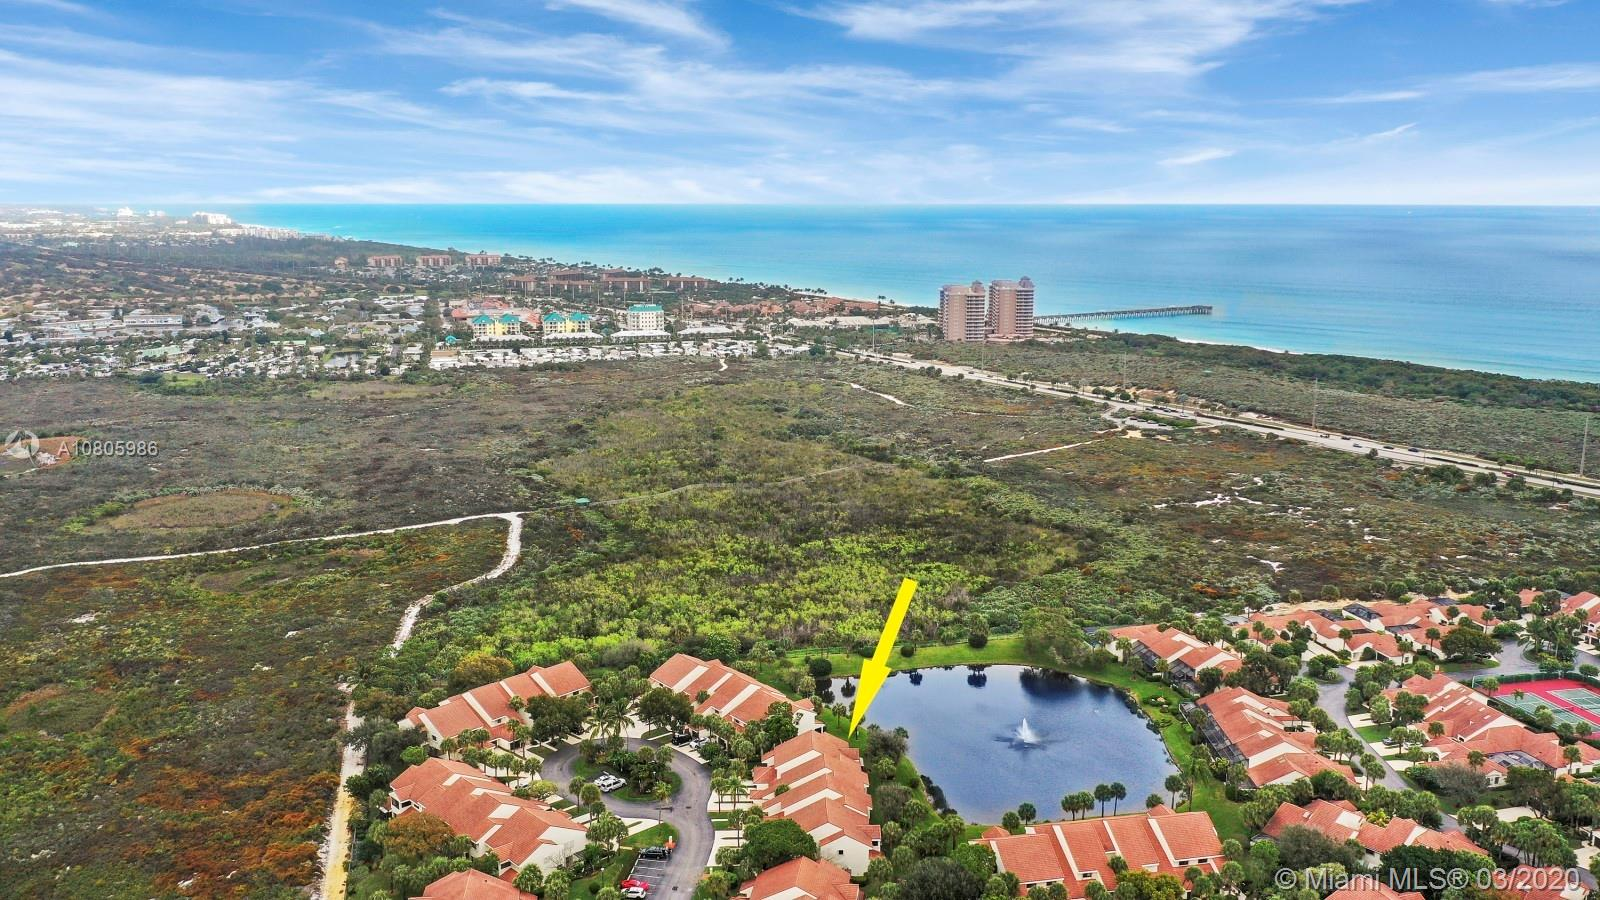 402 W Sea Oats Dr #A, Juno Beach, FL 33408 - Juno Beach, FL real estate listing